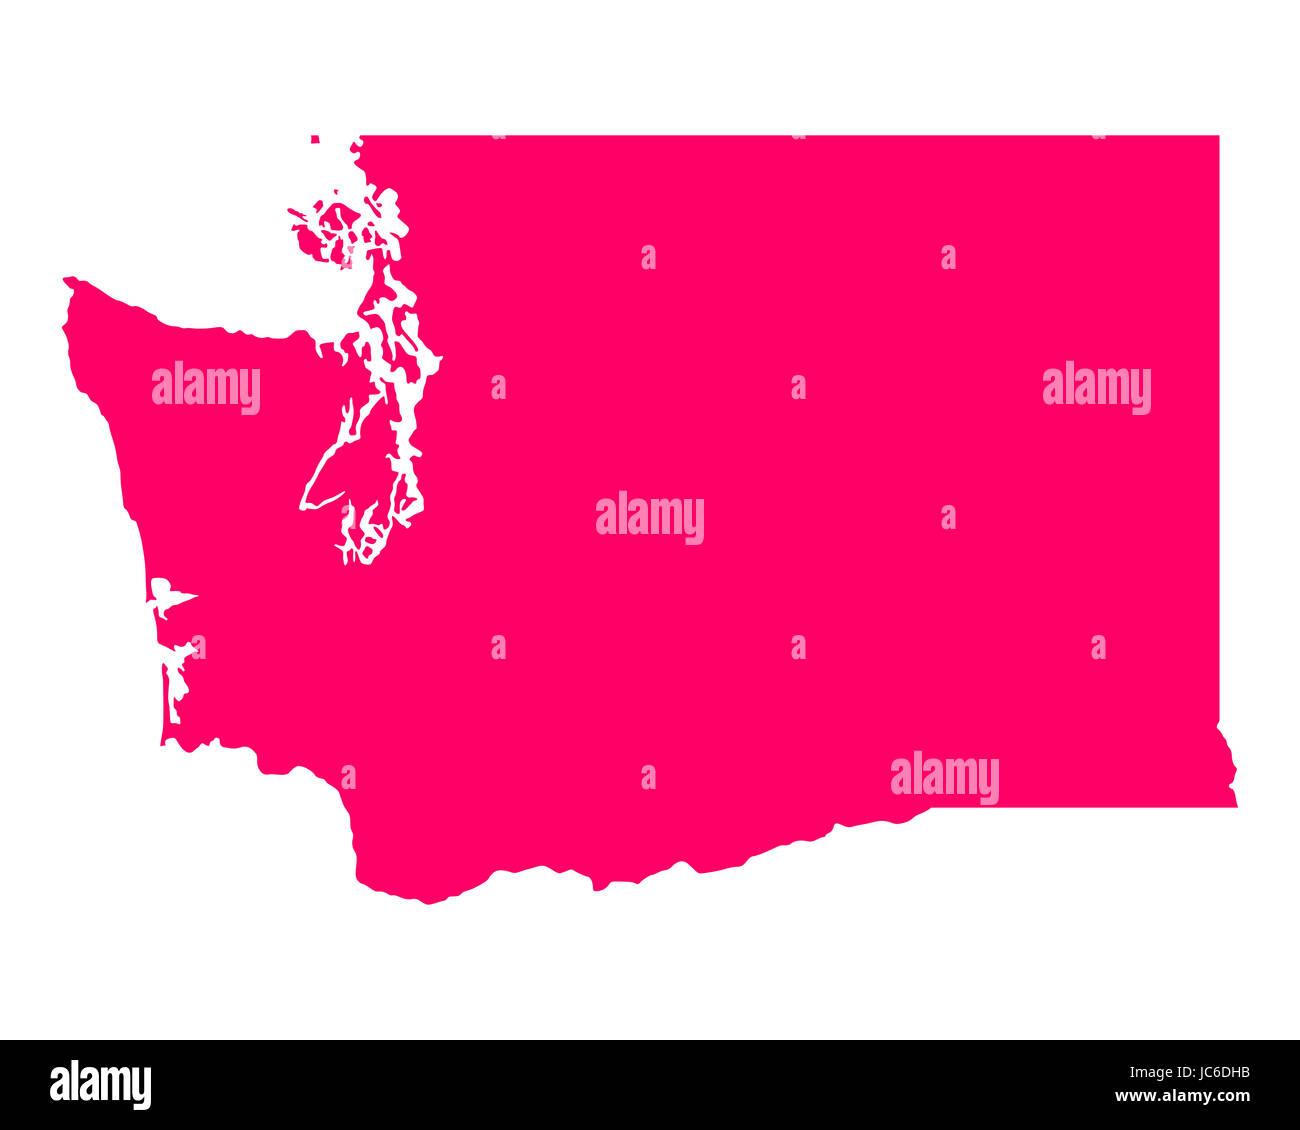 Karte von Washington - Stock Image